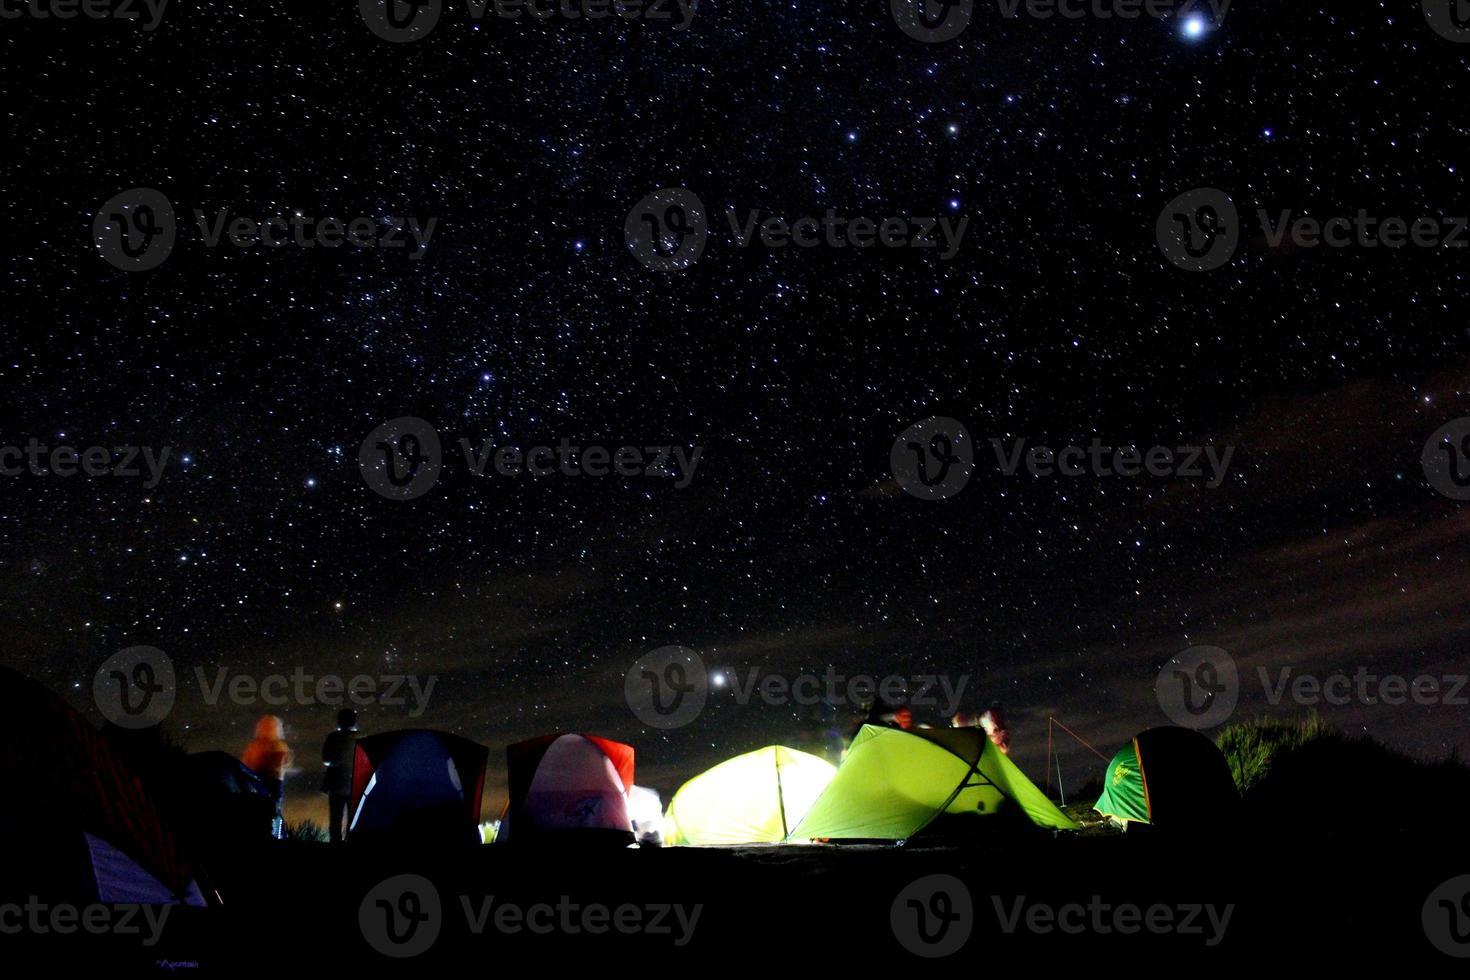 Stars and tent photo